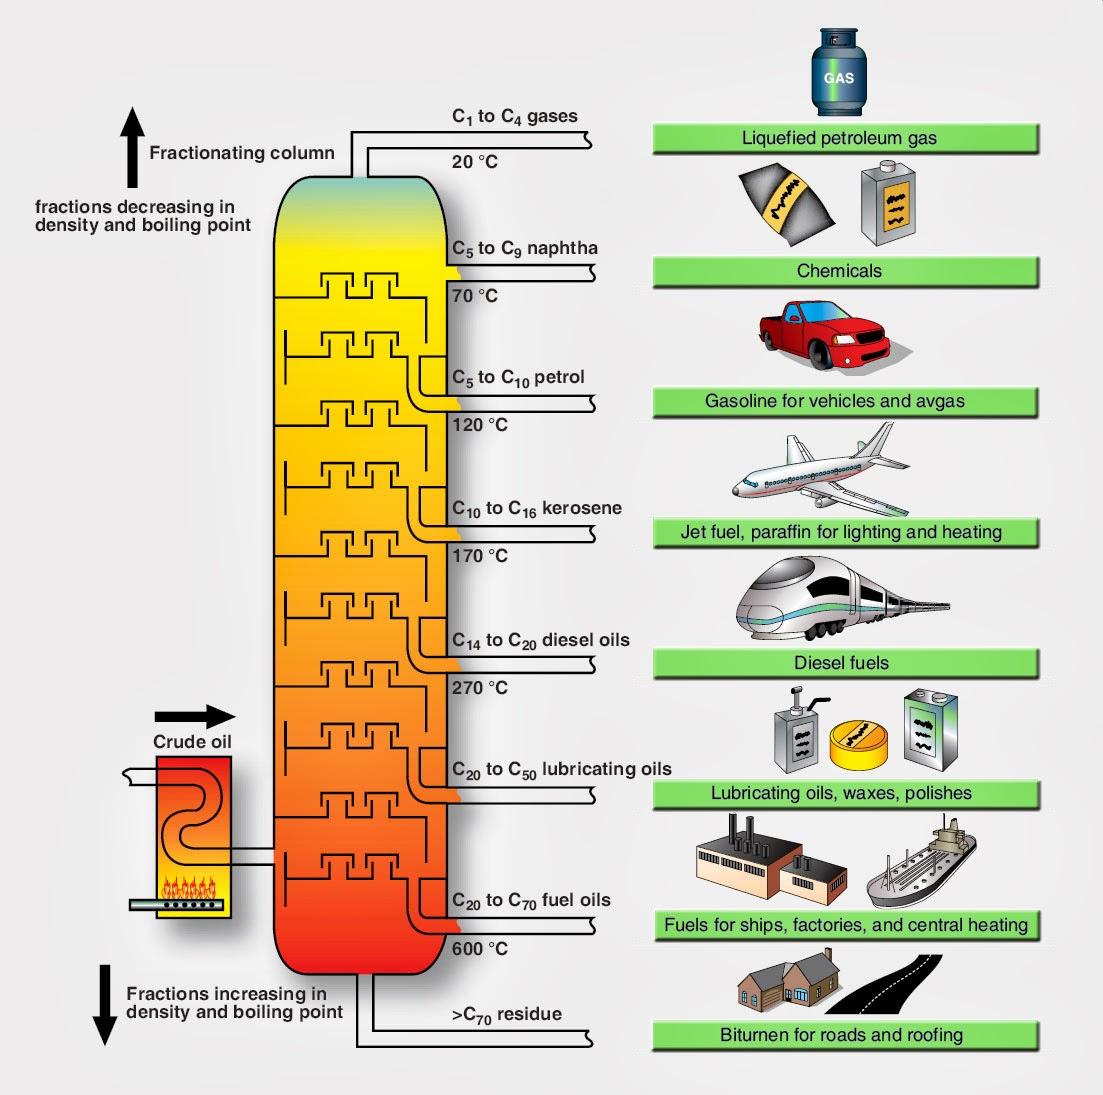 aircraft fuel filters